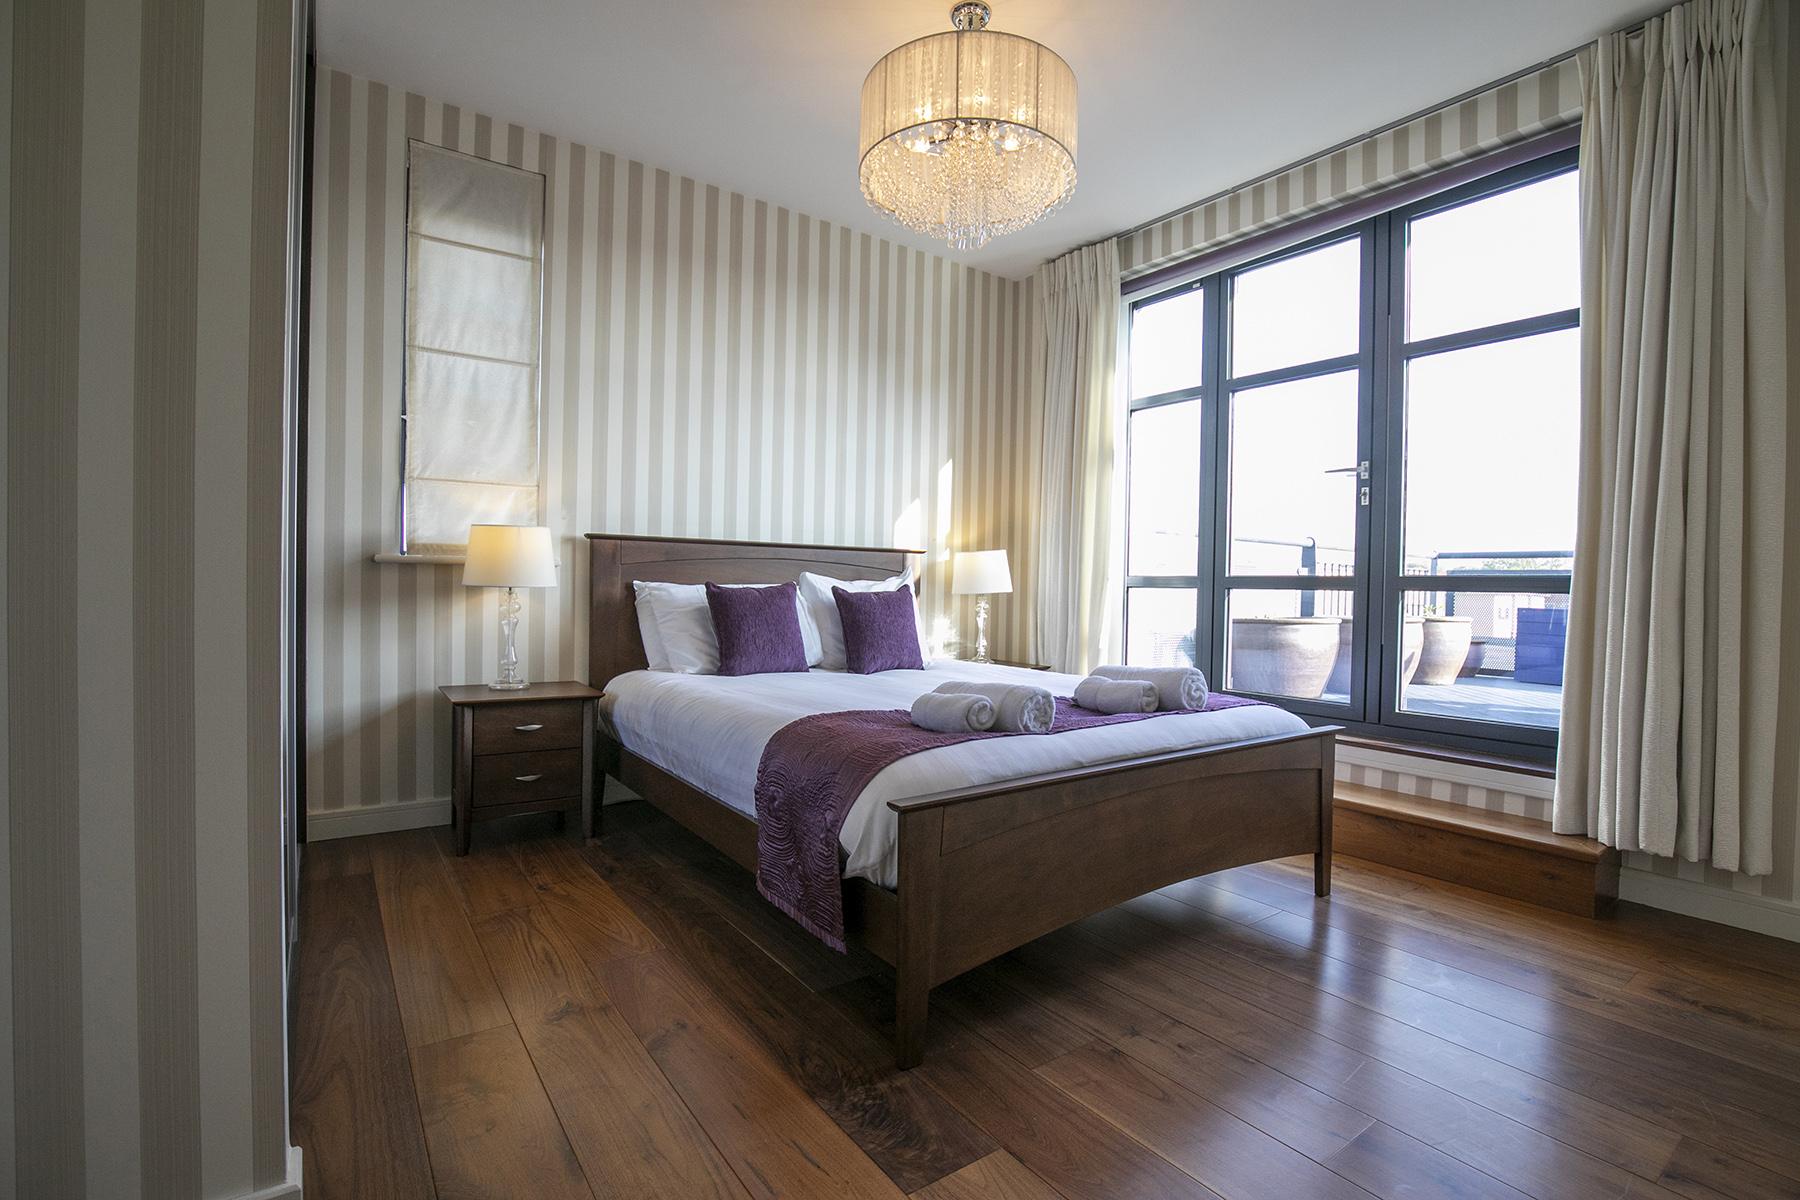 Bed at Wallis Square Apartments, Centre, Farnborough - Citybase Apartments